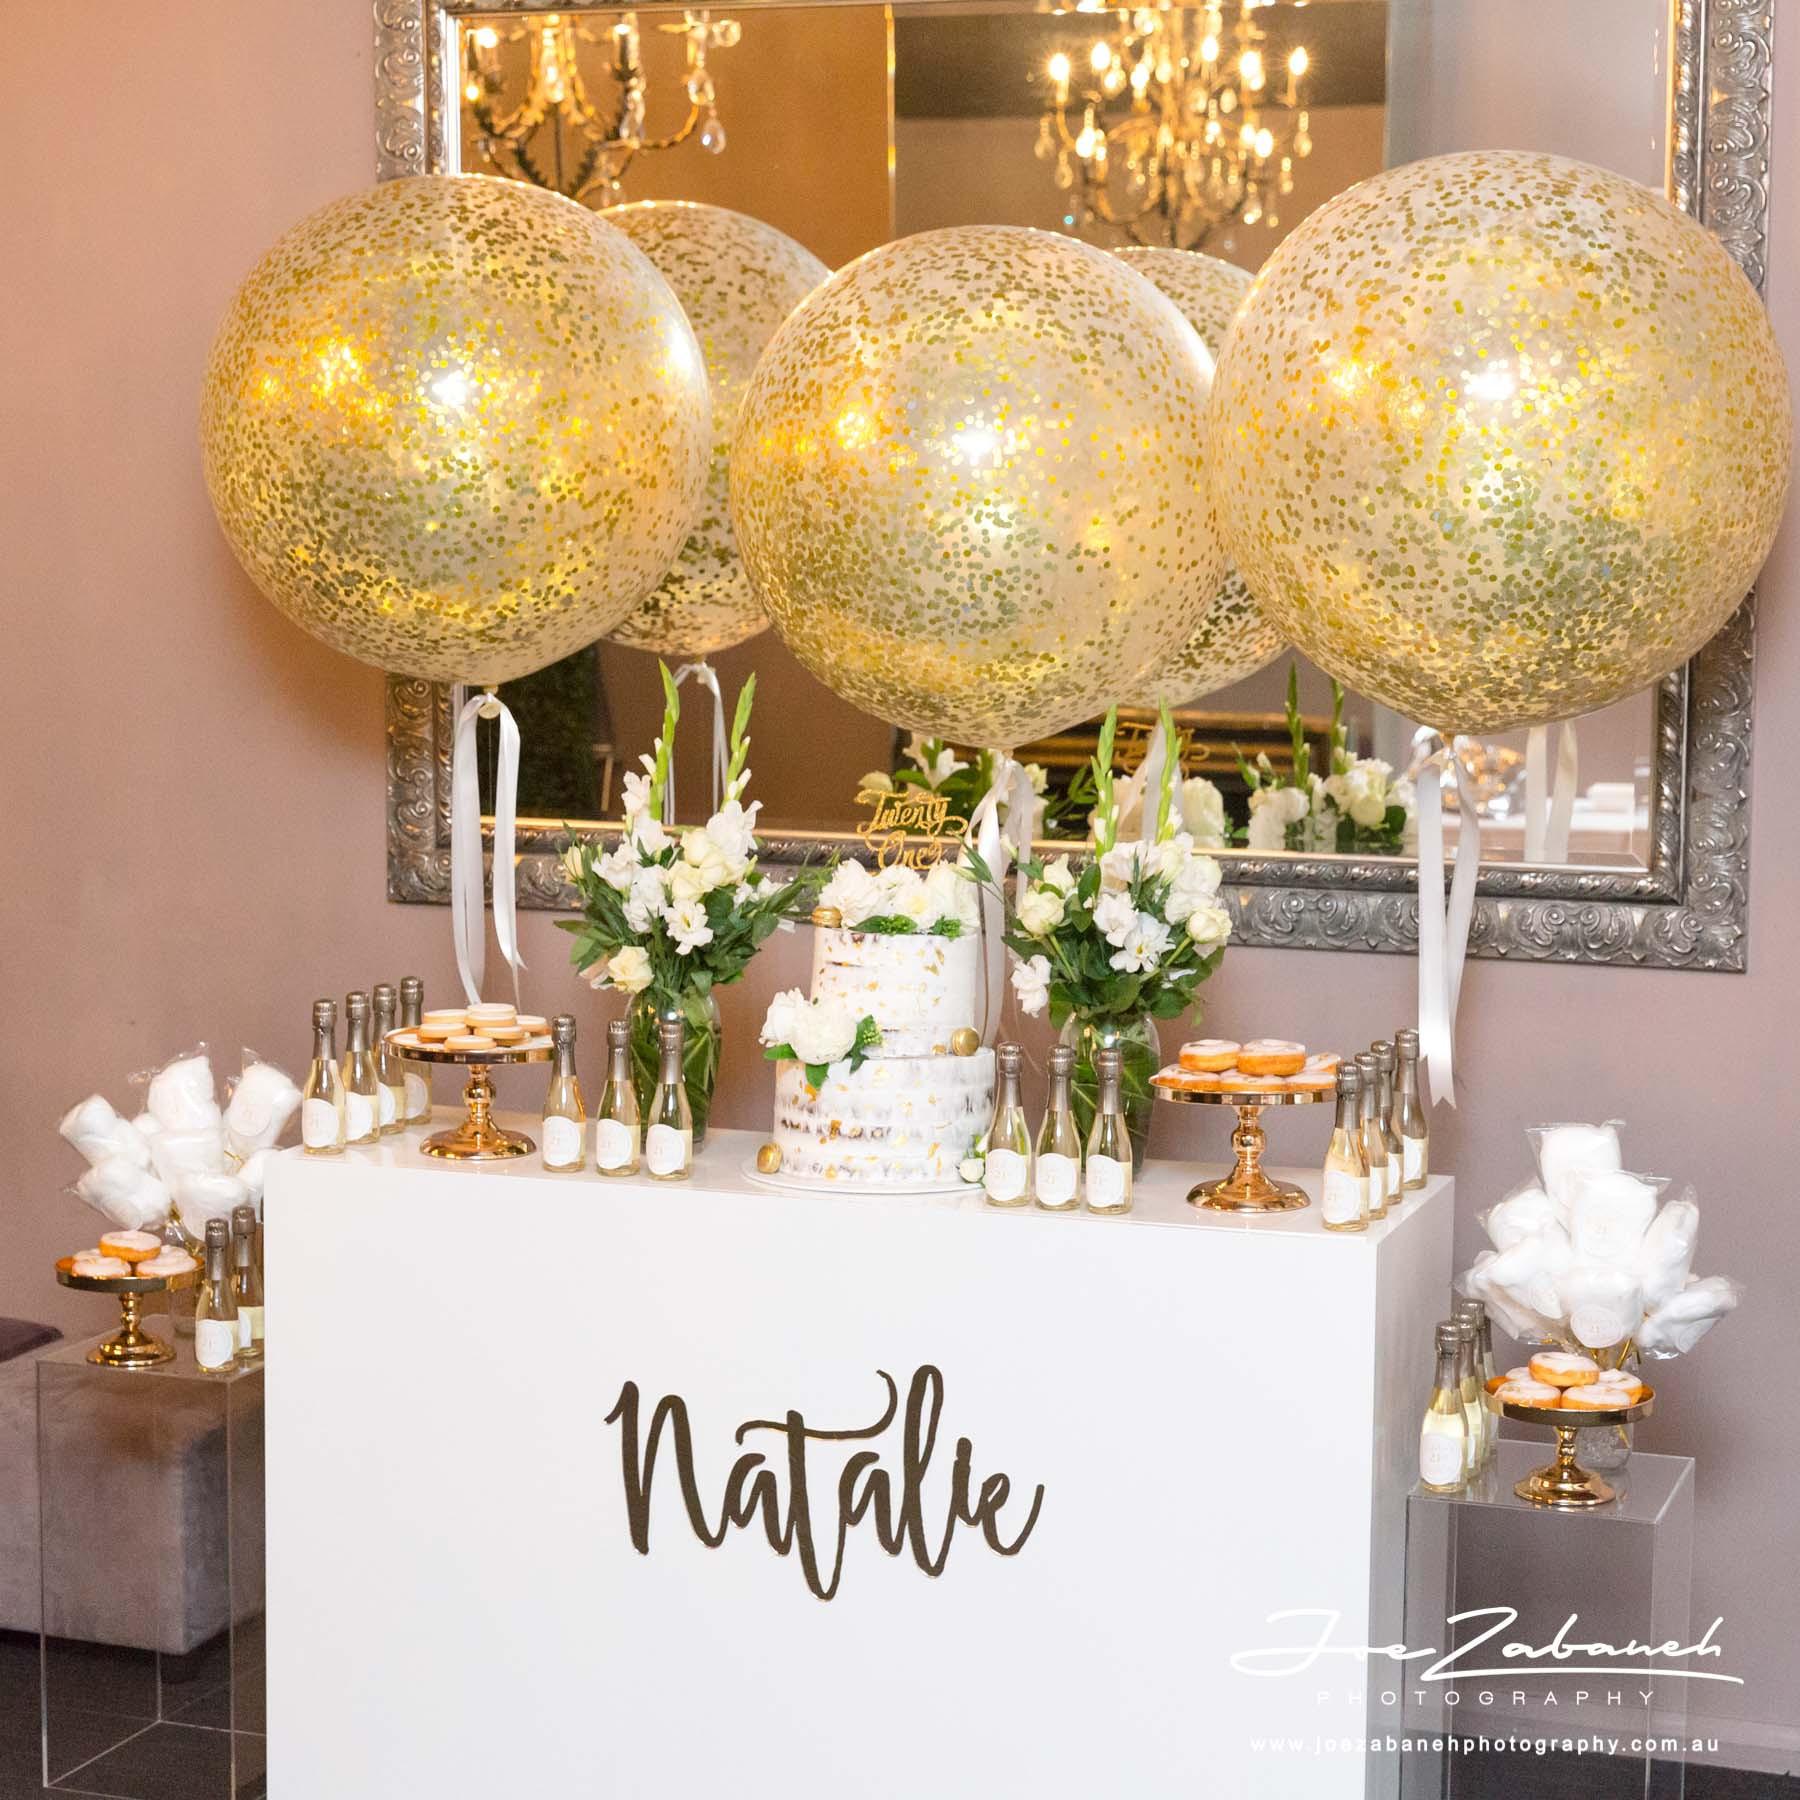 21st Birthday Decorations  Natalie s 21st Birthday Decorations Pixel Perfect